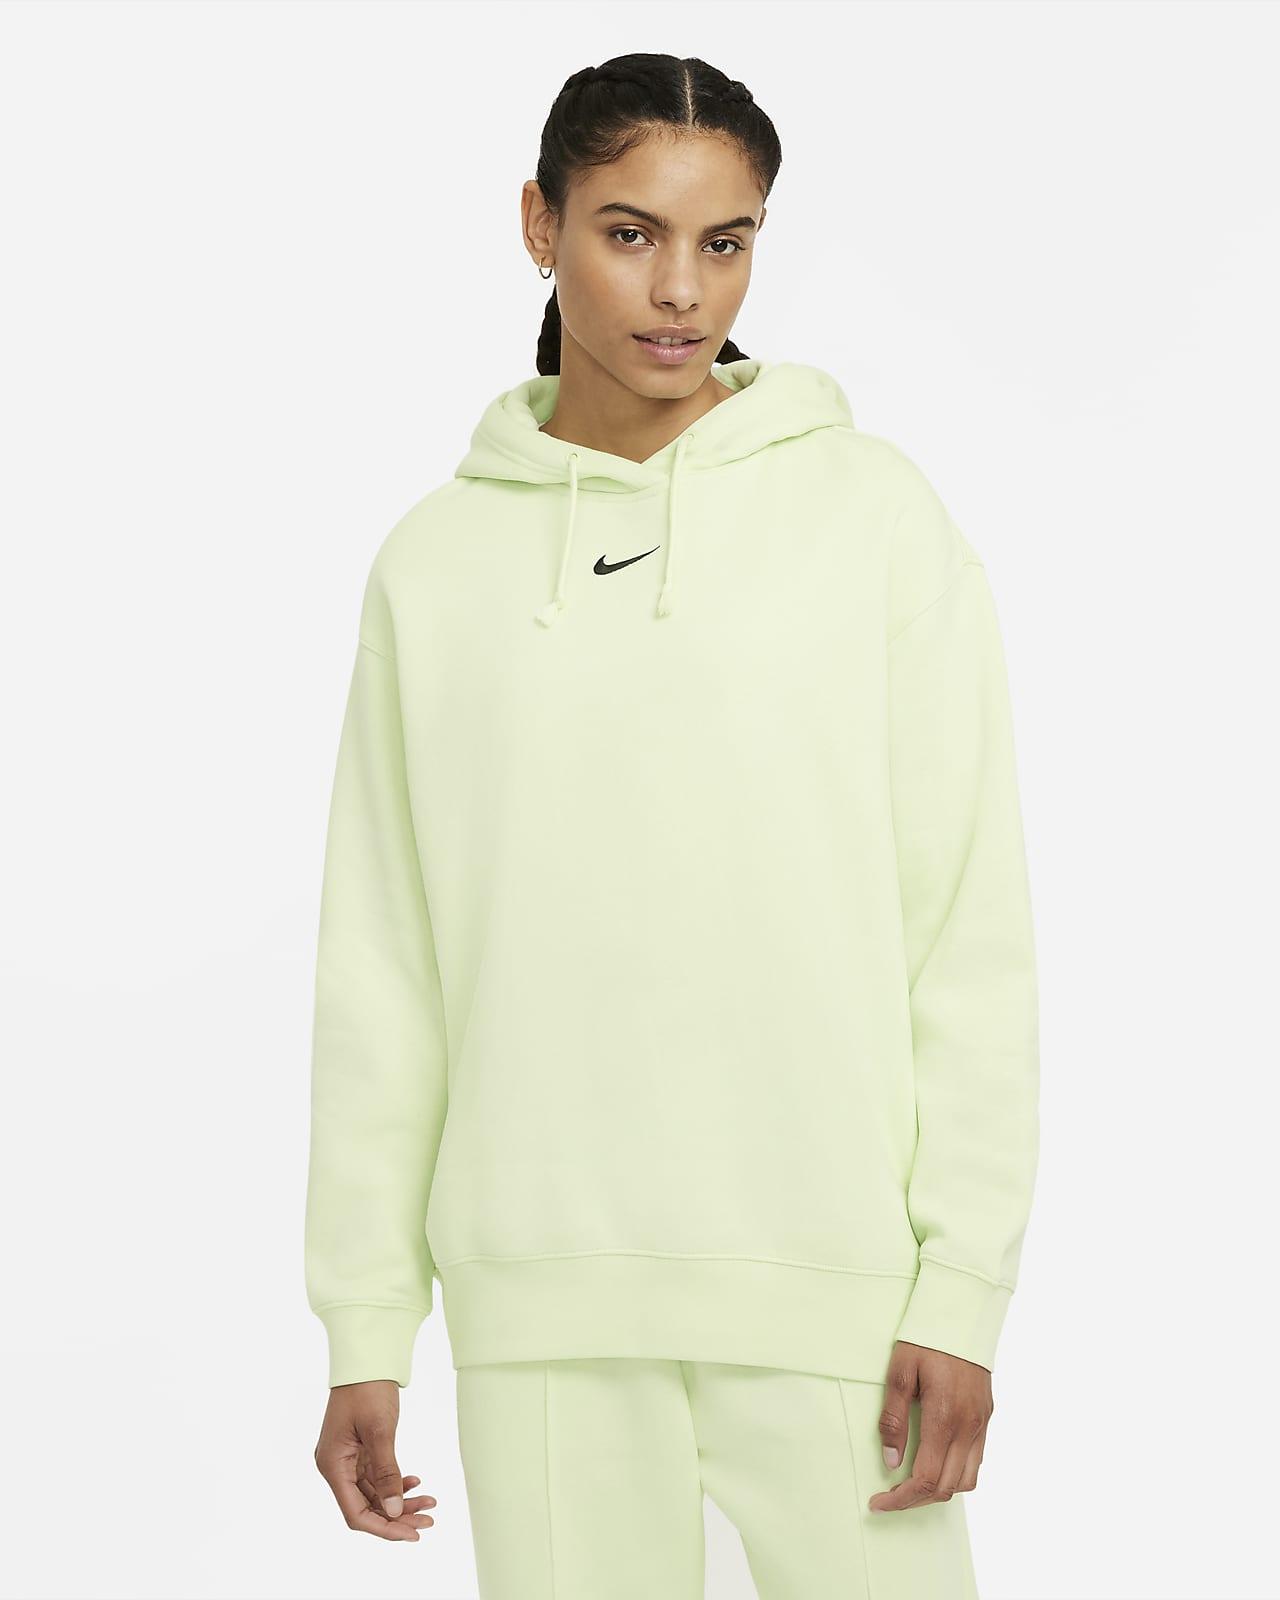 Nike Sportswear Essential Collection Sudadera con capucha de tejido Fleece oversize - Mujer